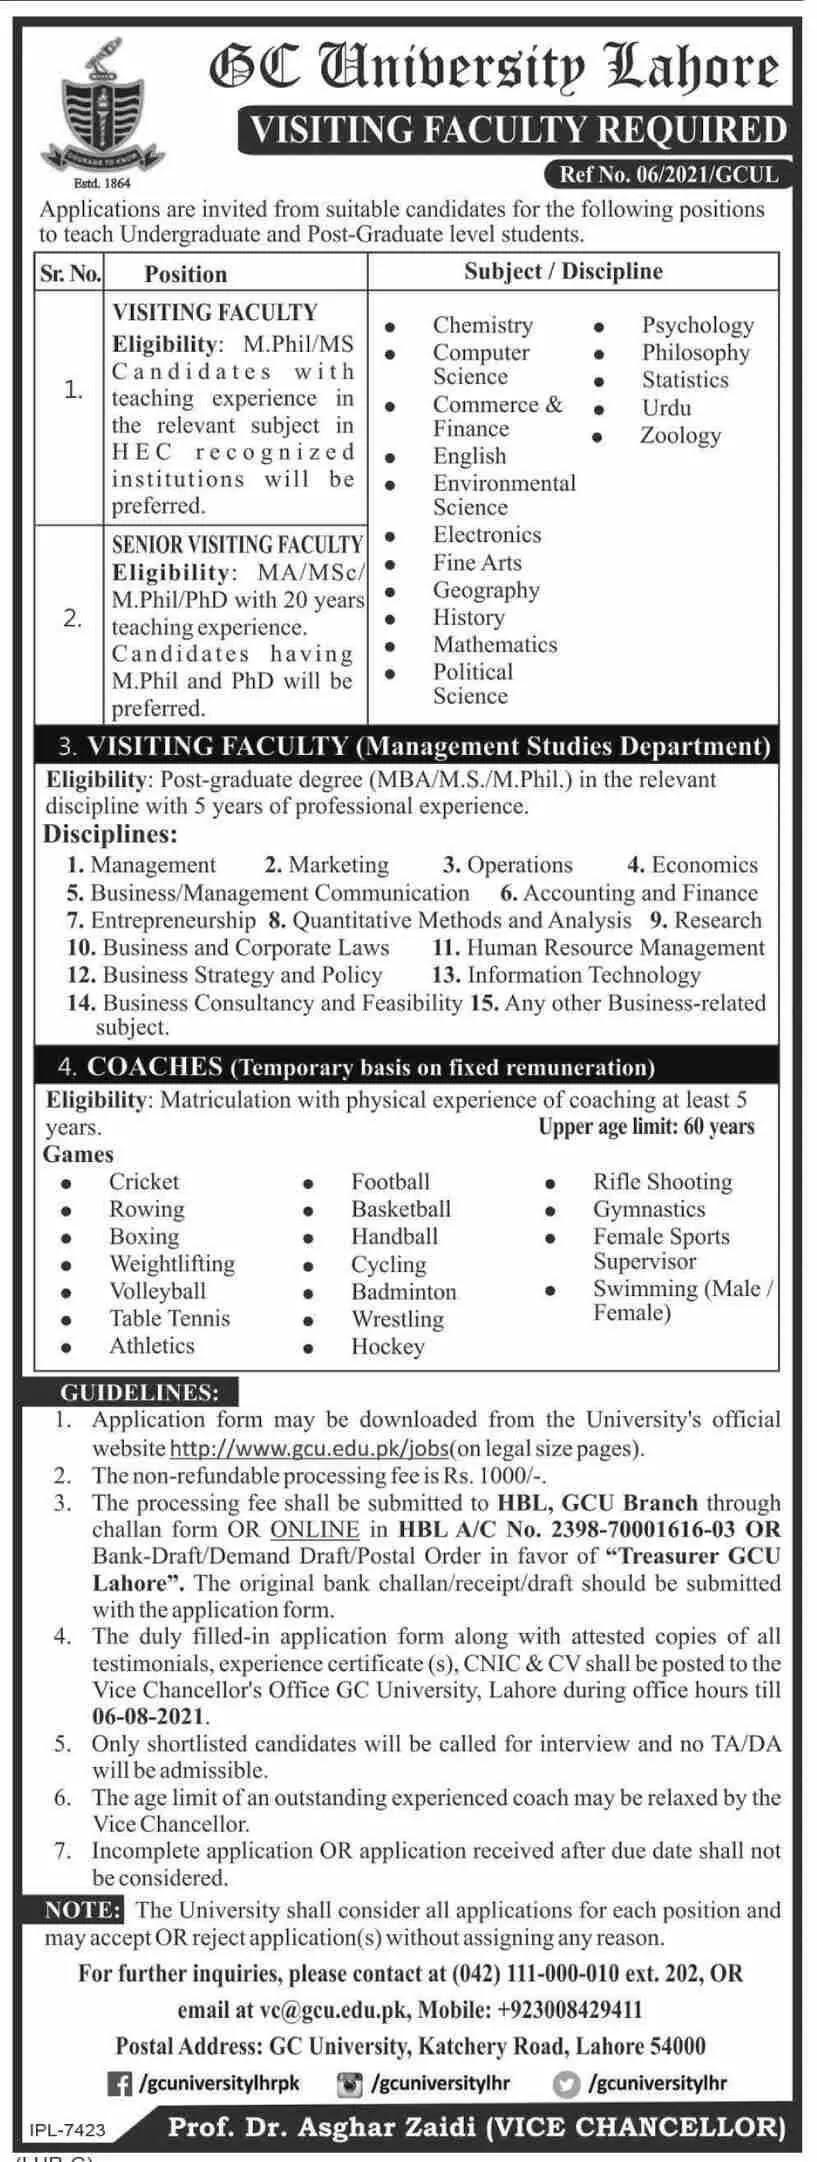 GC University Lahore Jobs 2021 in Pakistan - www.gcu.edu.pk Jobs 2021 - Lahore Latest Jobs 2021 - Lahore Jobs 2021